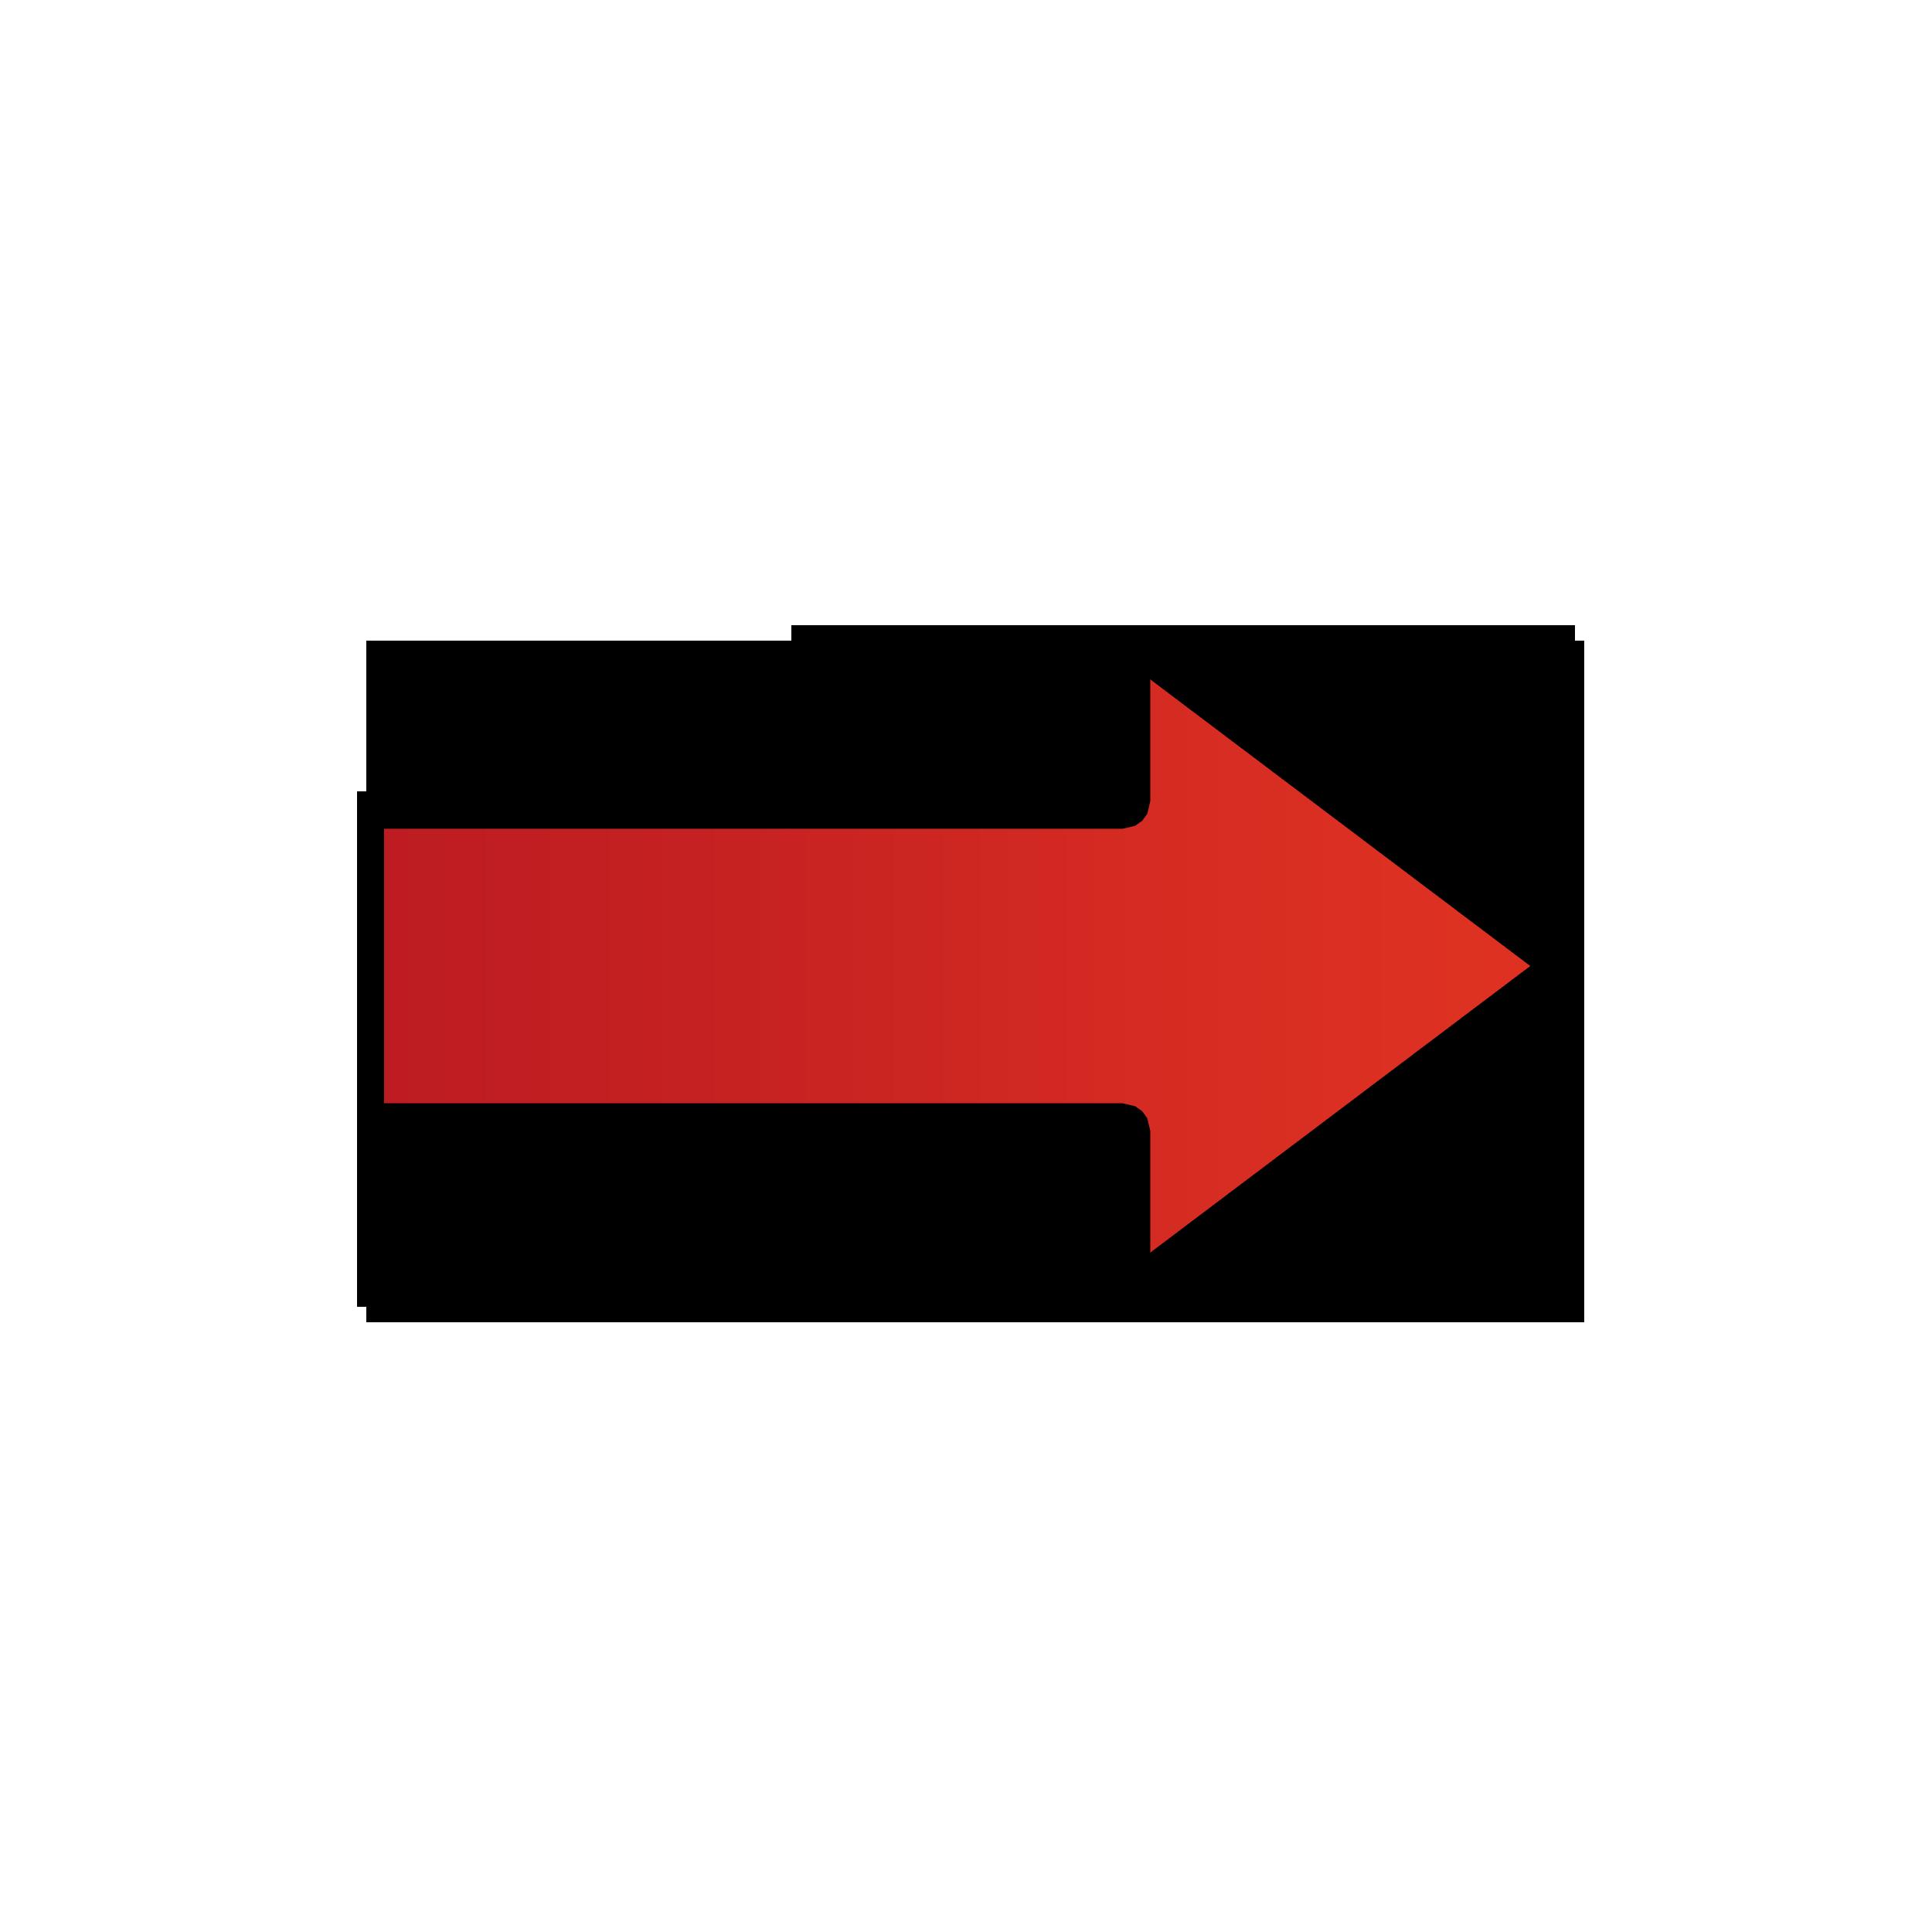 red-arrow-black-outline.png